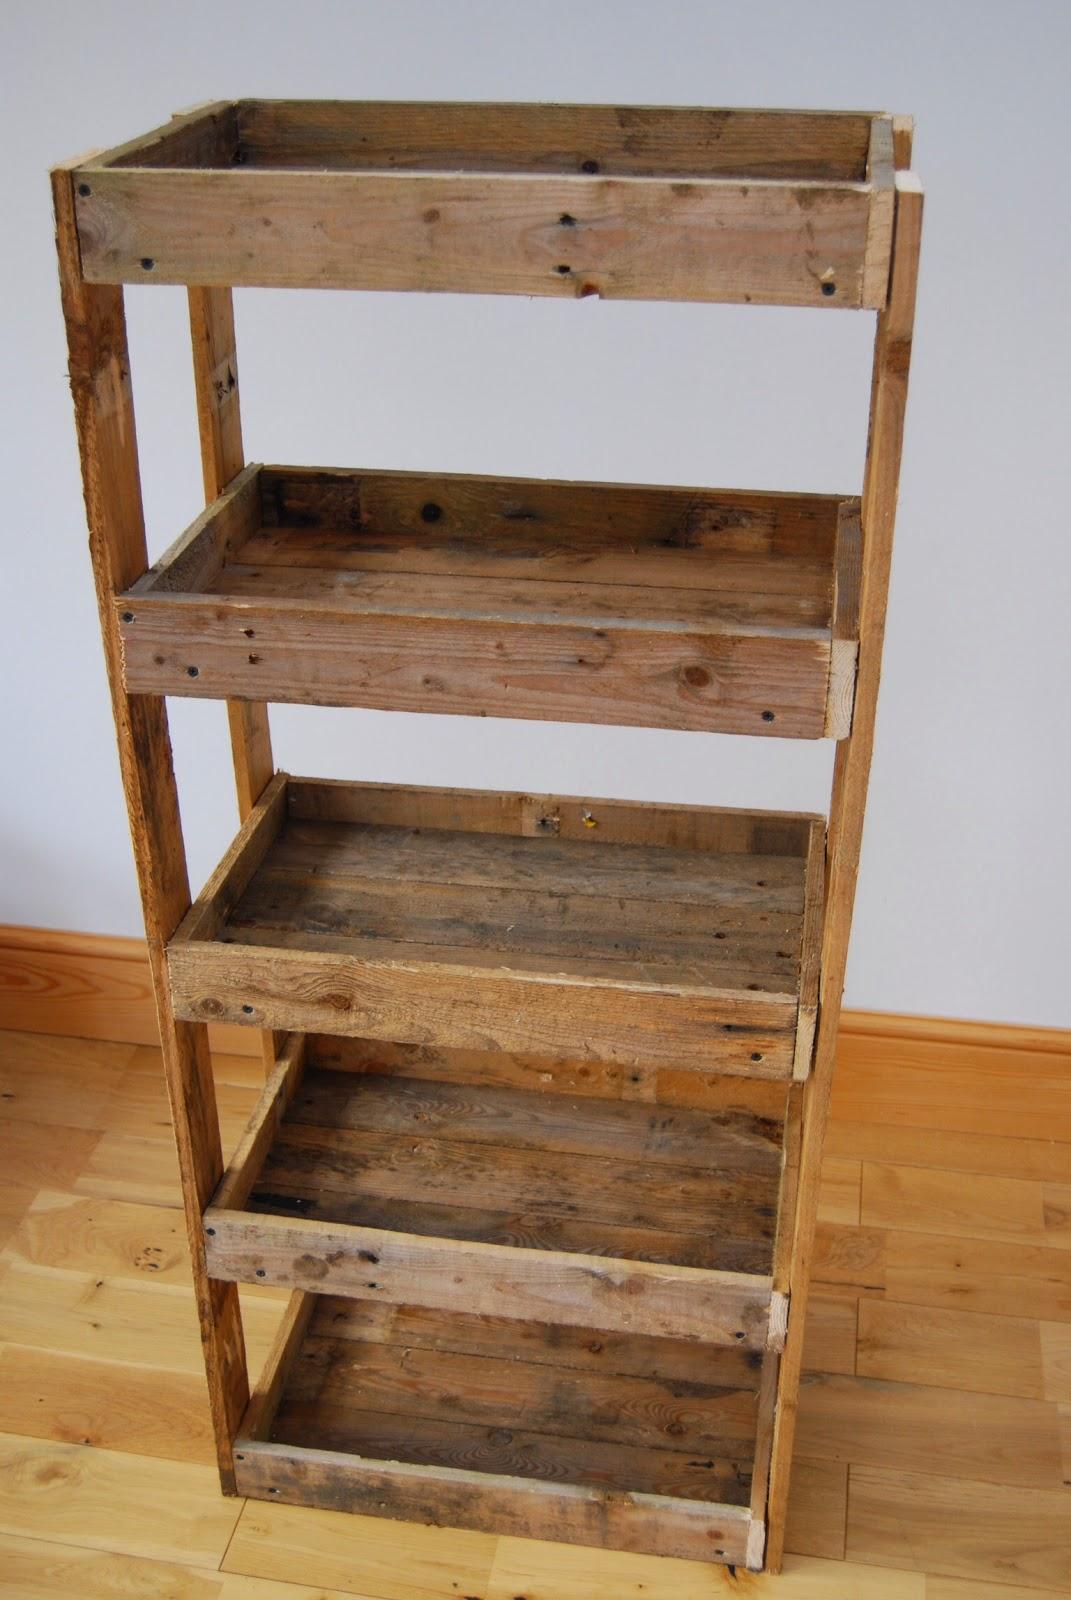 Pallet Wood Shelving Unit | Brick Dust & Glitter